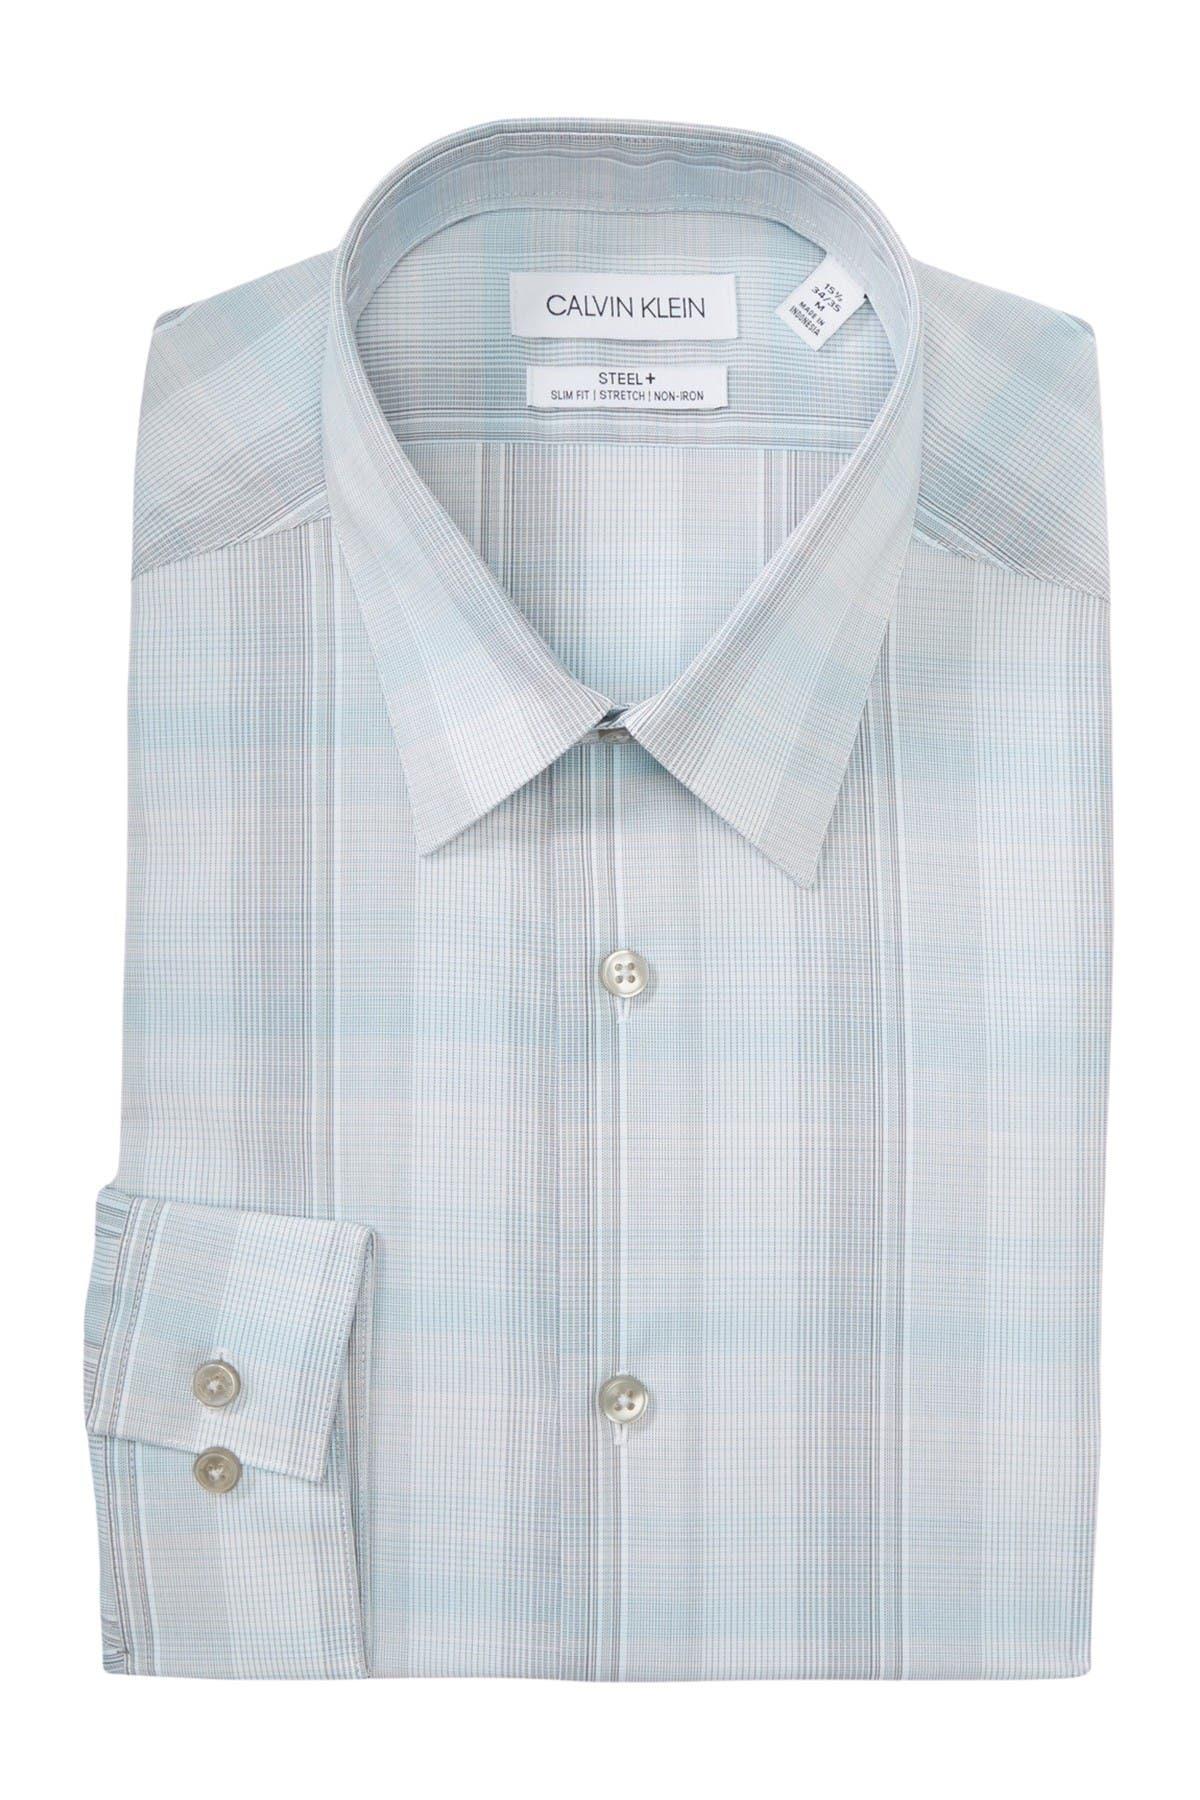 Image of Calvin Klein Steel+ Slim Fit Dress Shirt